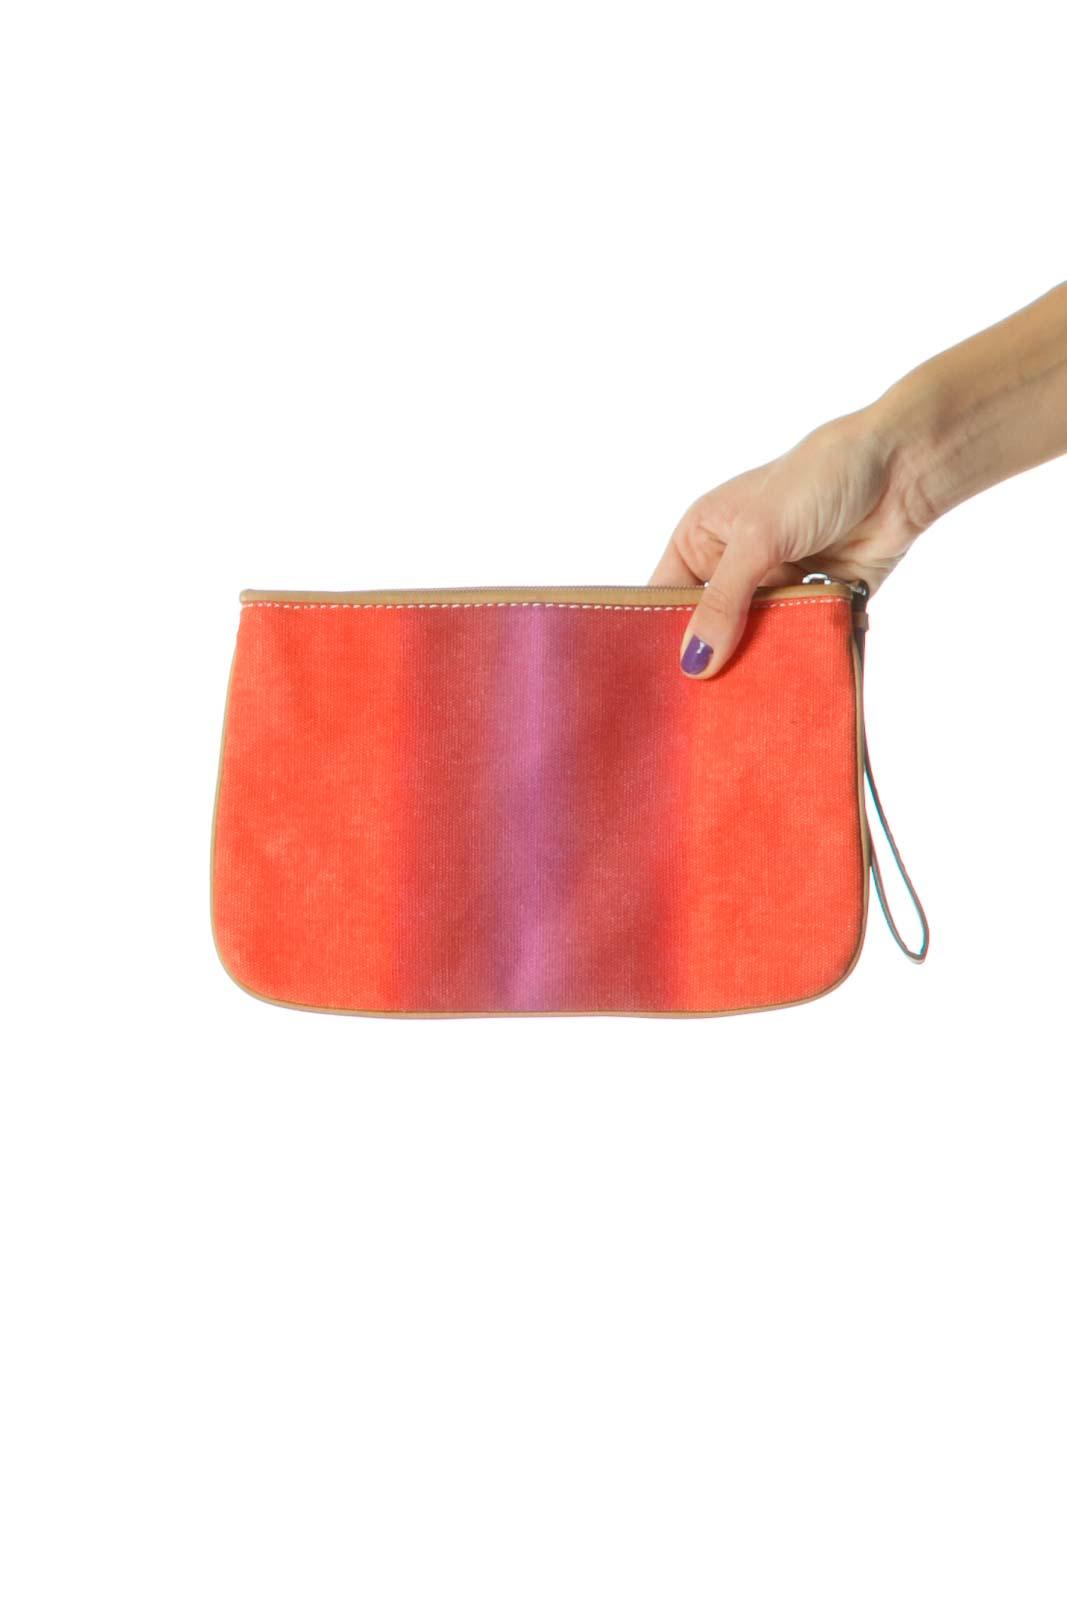 Orange Purple Brown Zippered Medium SIze Wristlet